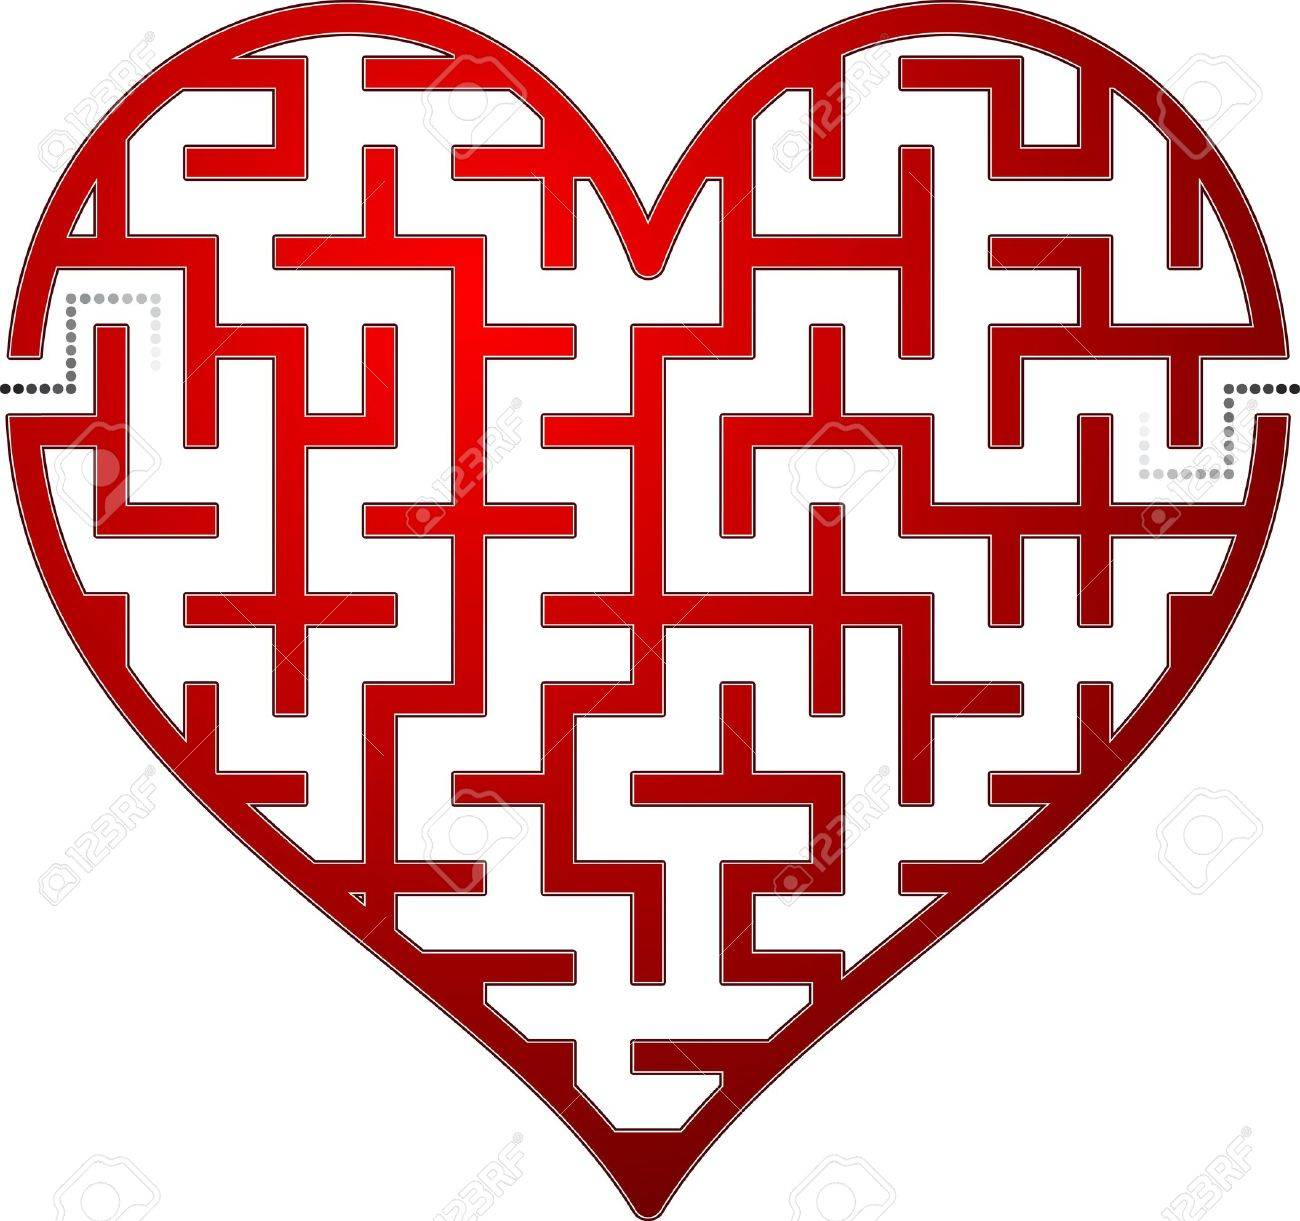 Uncategorized Valentine Mazes heart maze vector illustration royalty free cliparts vectors stock 11884132